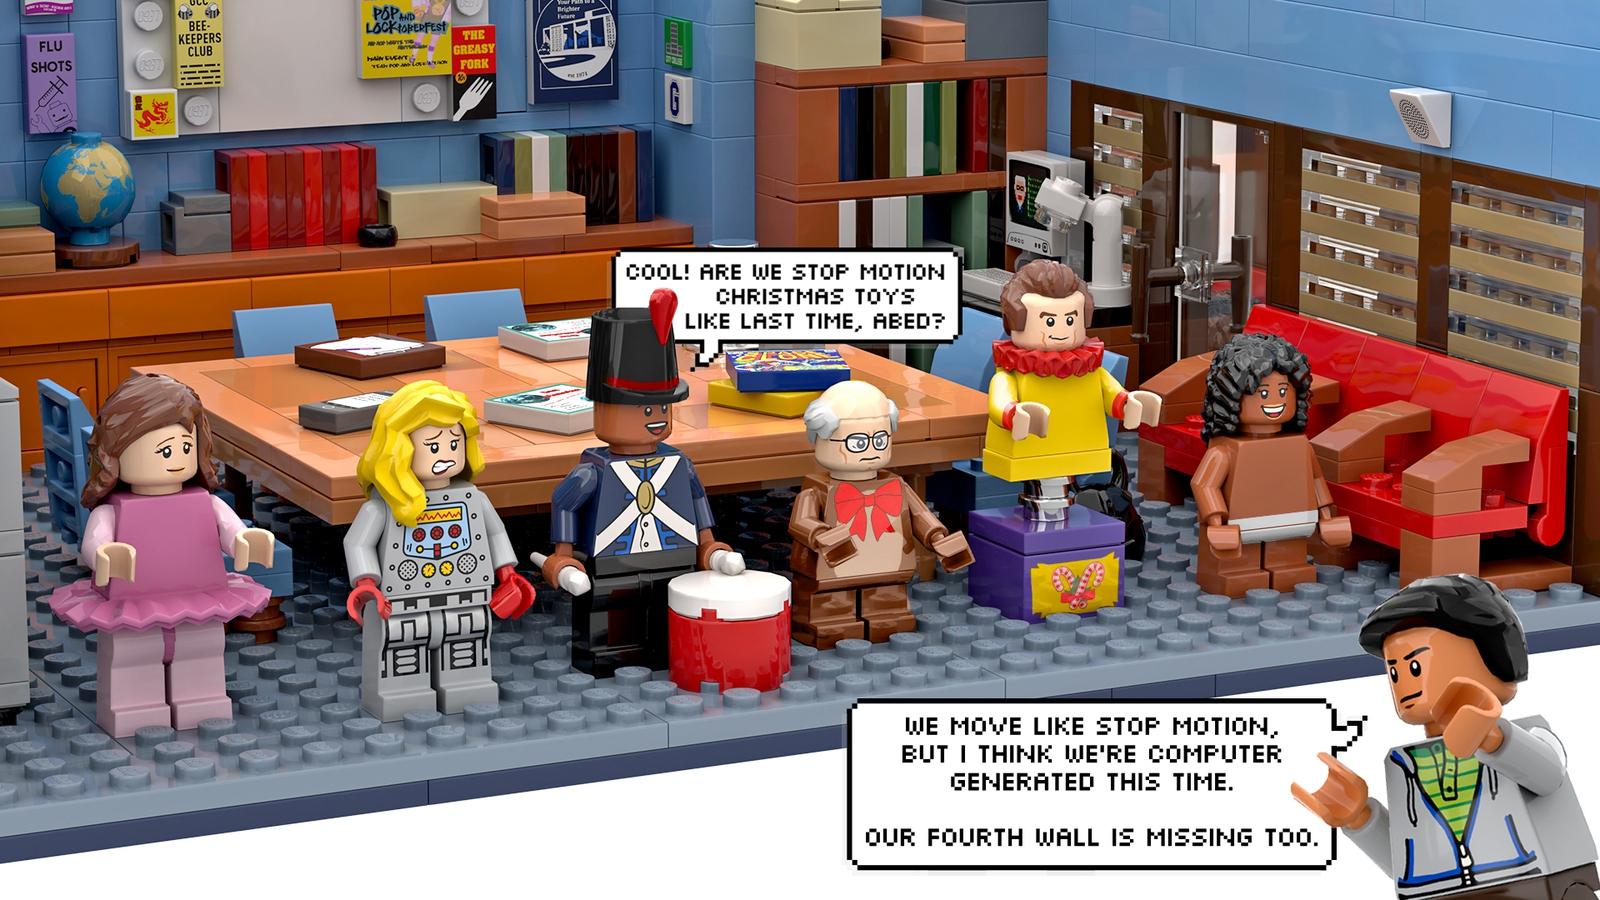 lego ideas community minifigures